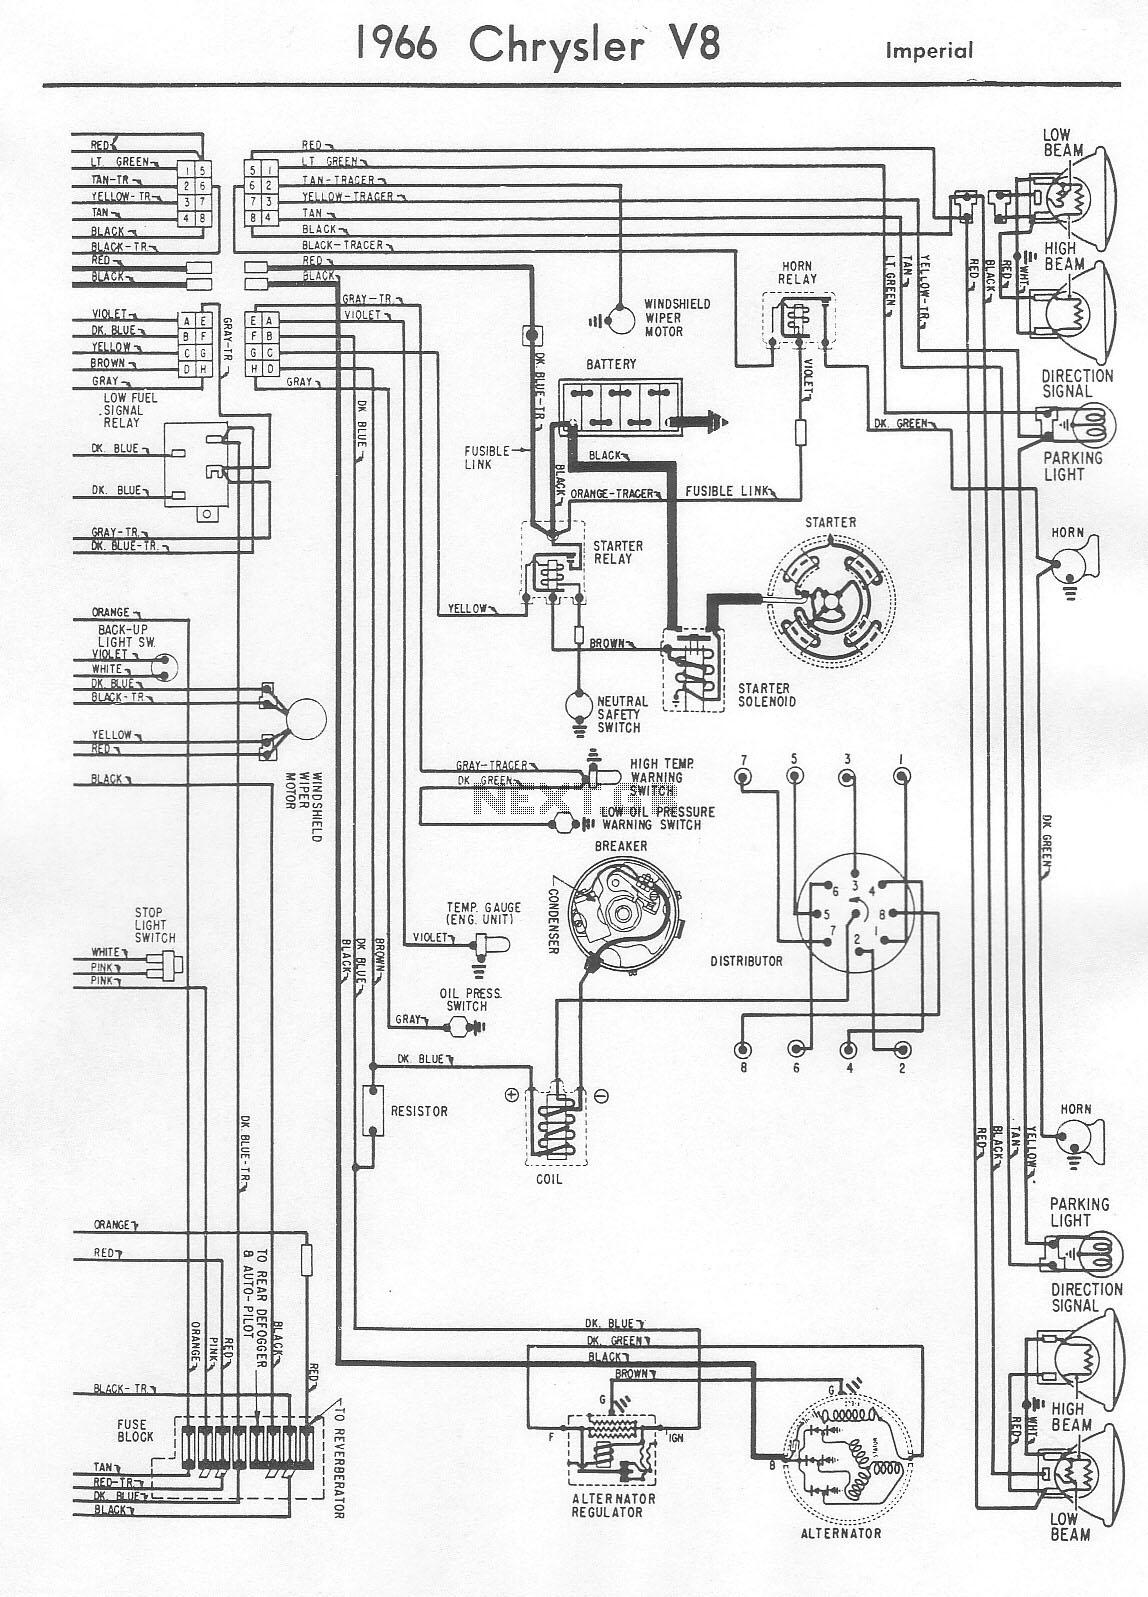 Chrysler Crown Marine Engine Diagram Wiring Diagrams Gray 1966 300 Library Boat 620